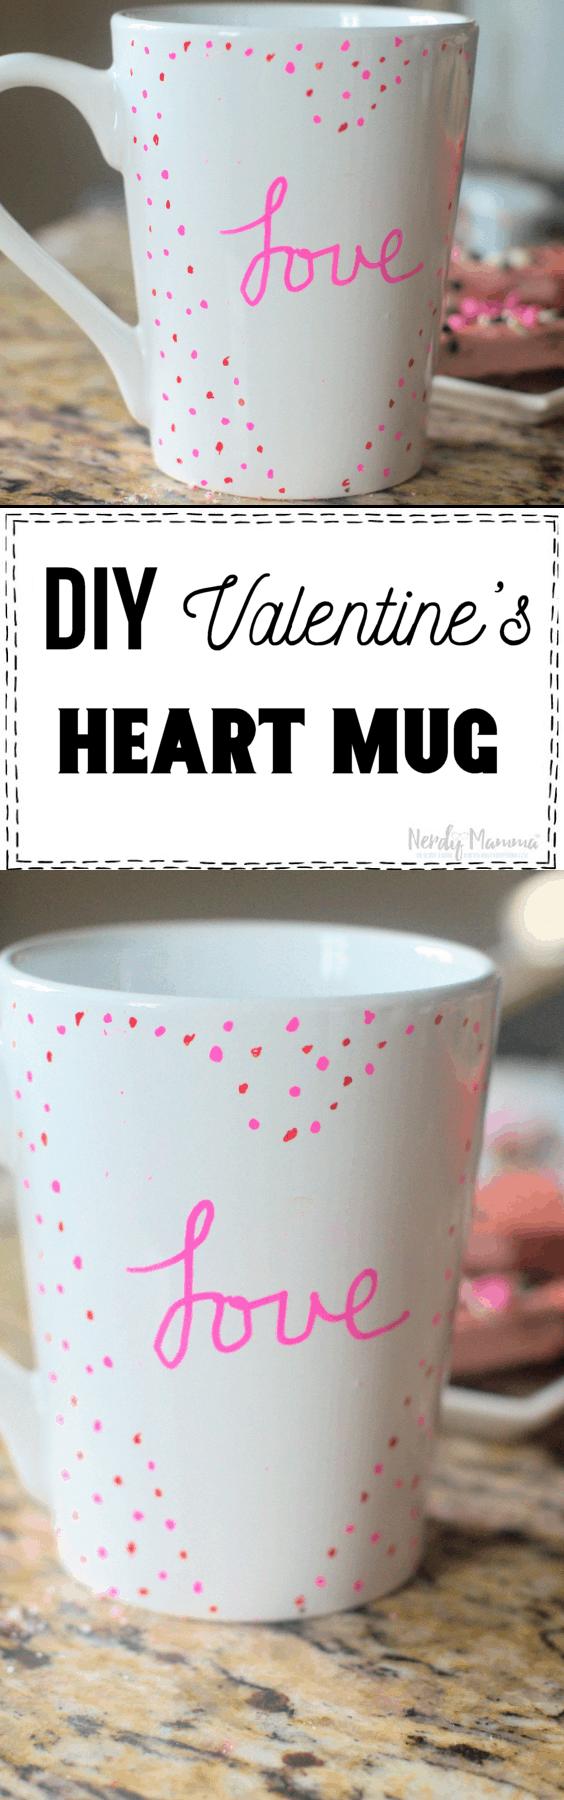 DIY Valentine's Heart Mug